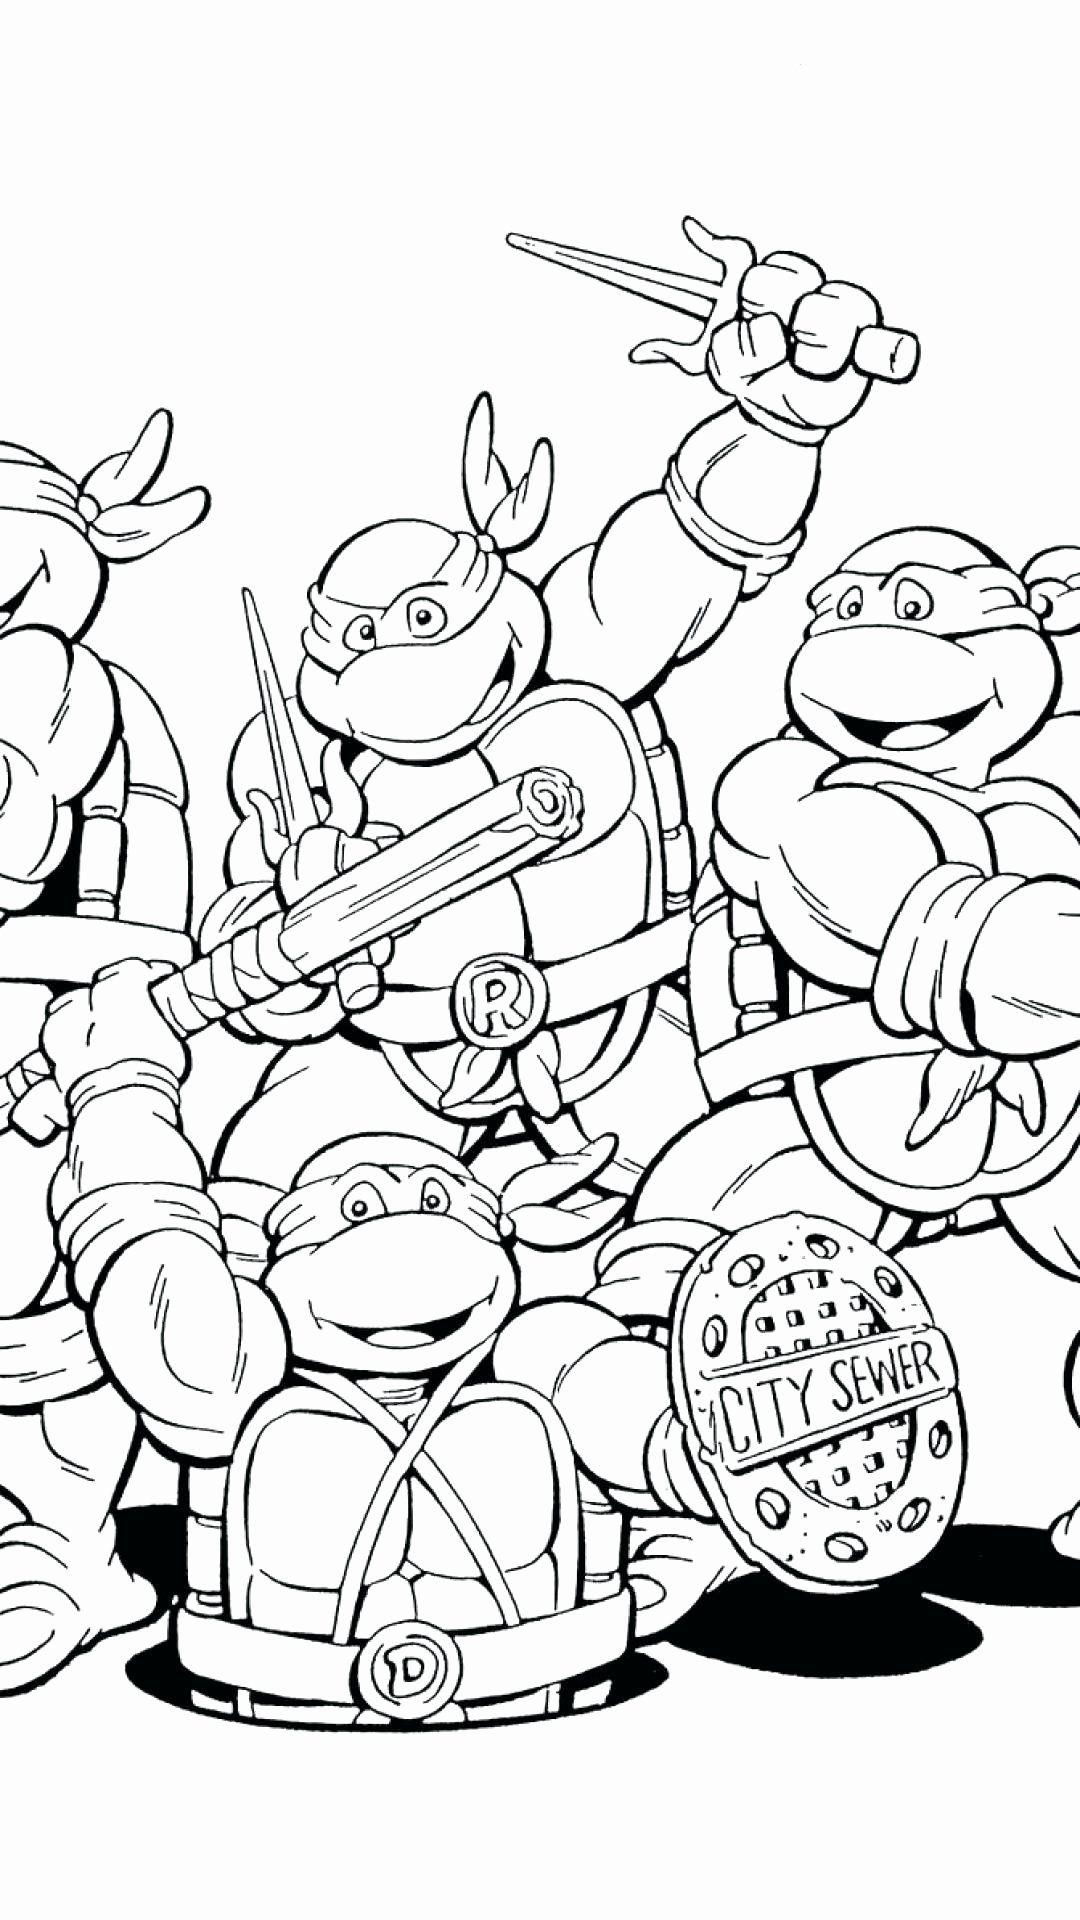 Ninja Turtle Coloring Pictures Unique Top 26 Great Teenage Mutant Ninja Turtles Colo Turtle Coloring Pages Ninja Turtle Coloring Pages Superhero Coloring Pages